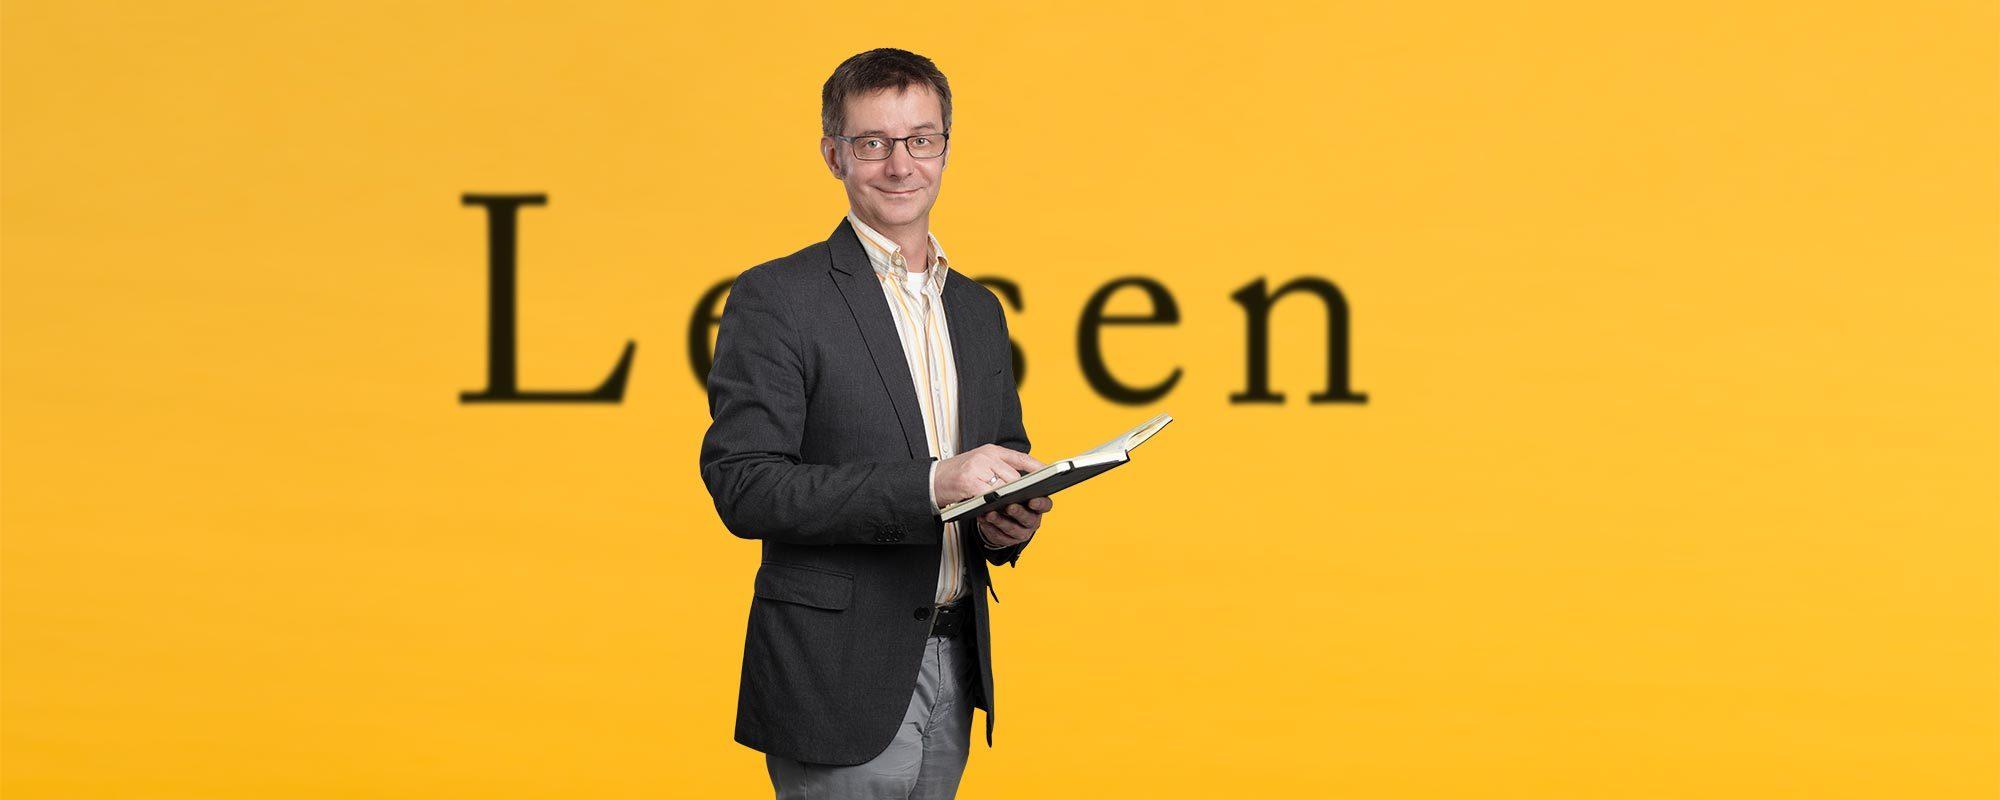 Mag-Martin-Weber-Lesen